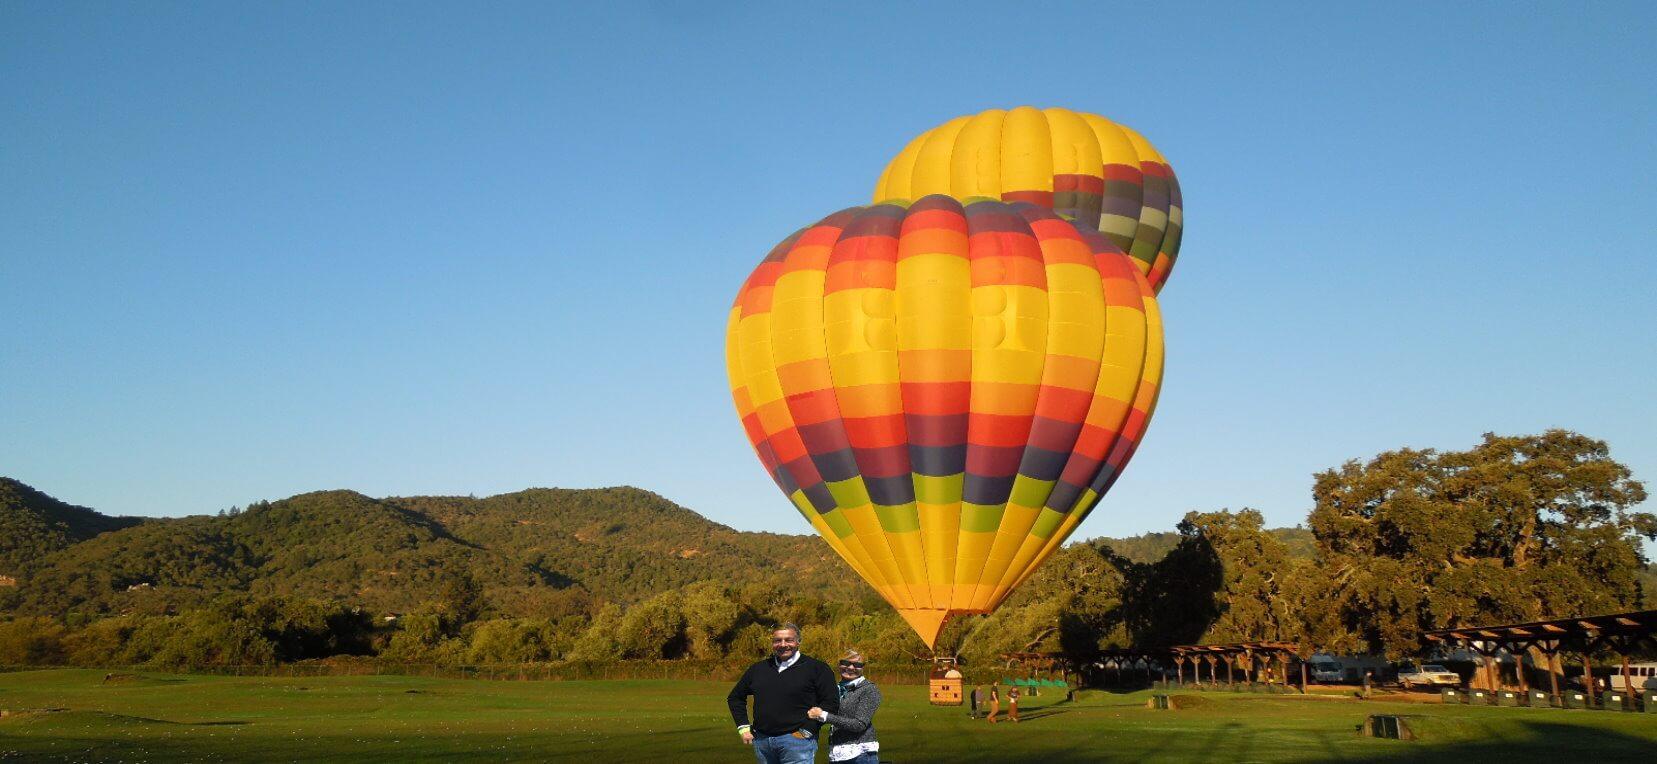 Balloons-Above-the-Valley-Hot-Air-Balloon-Flights